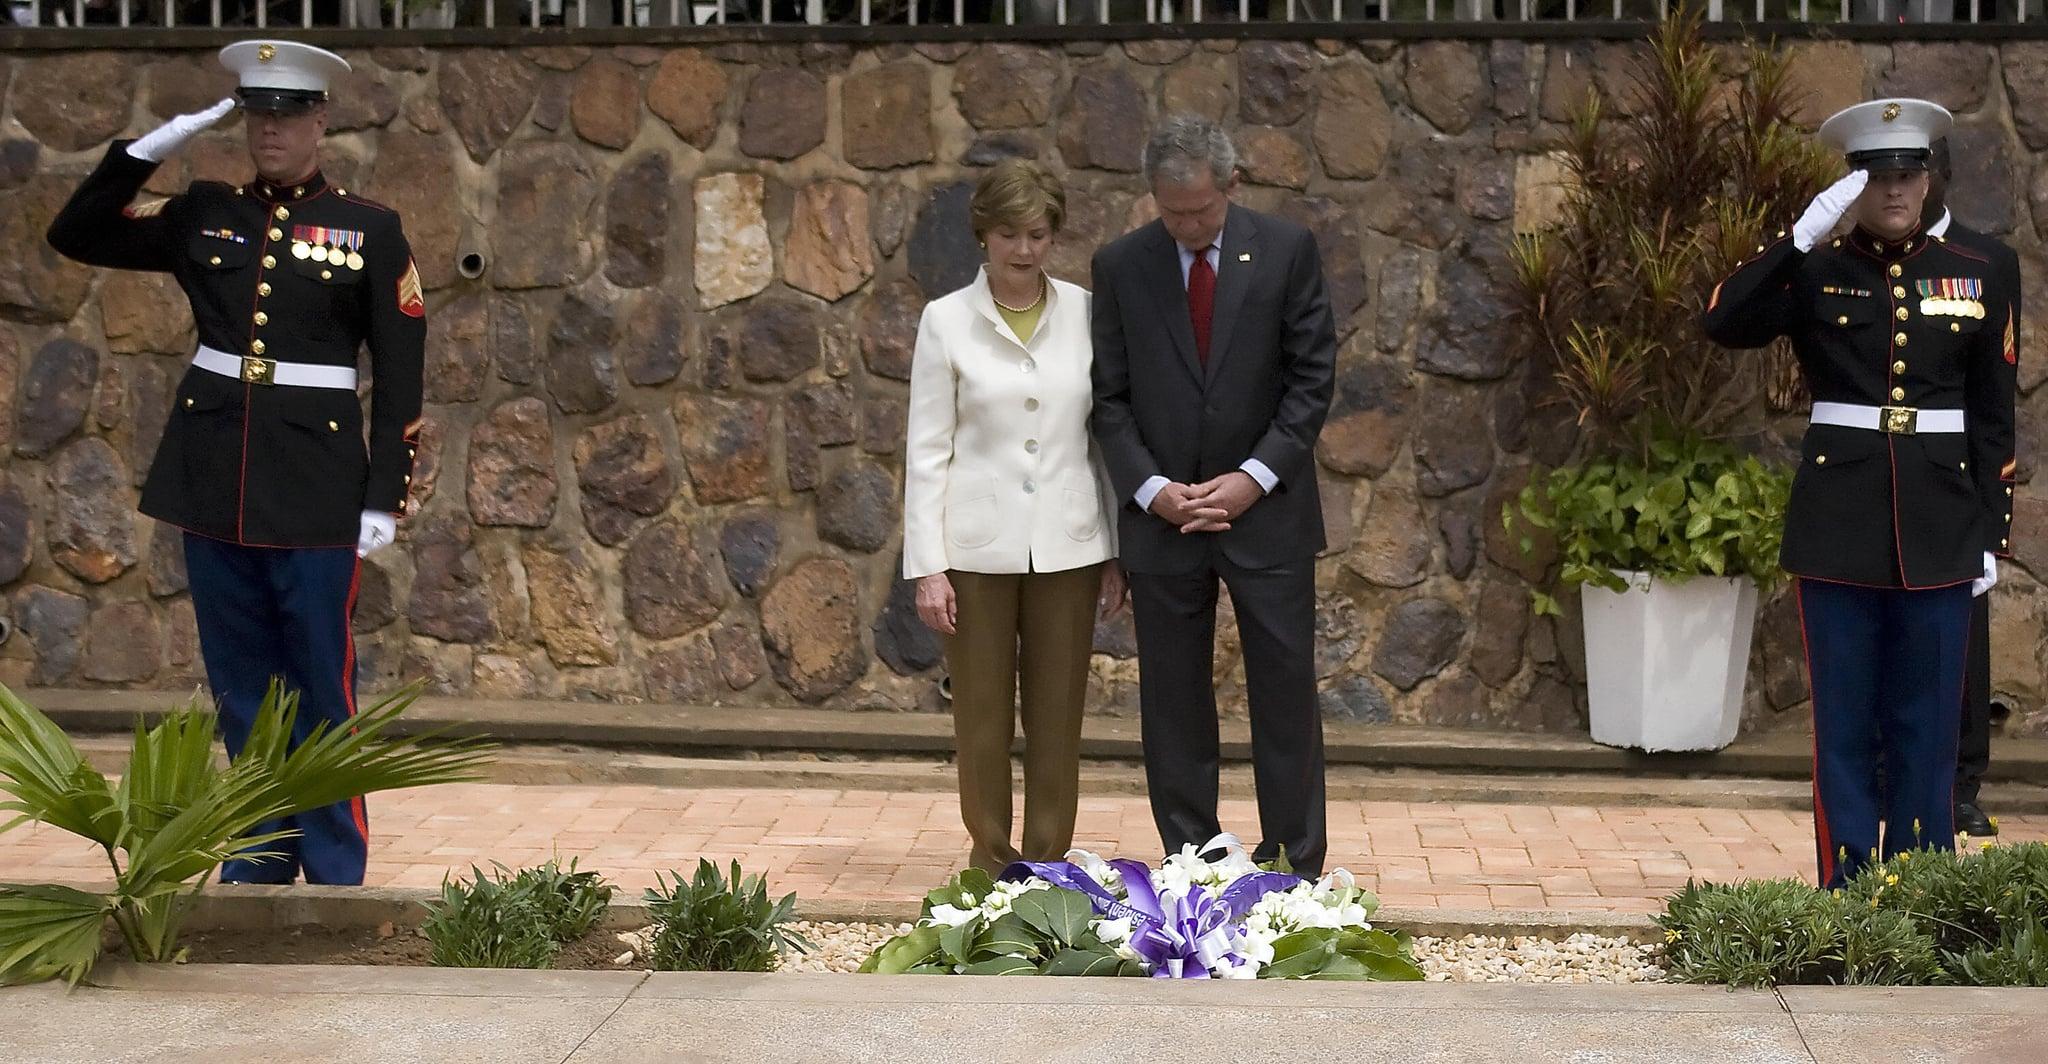 Mr. and Mrs. Bush lay a wreath at a Rwanda genocide memorial.